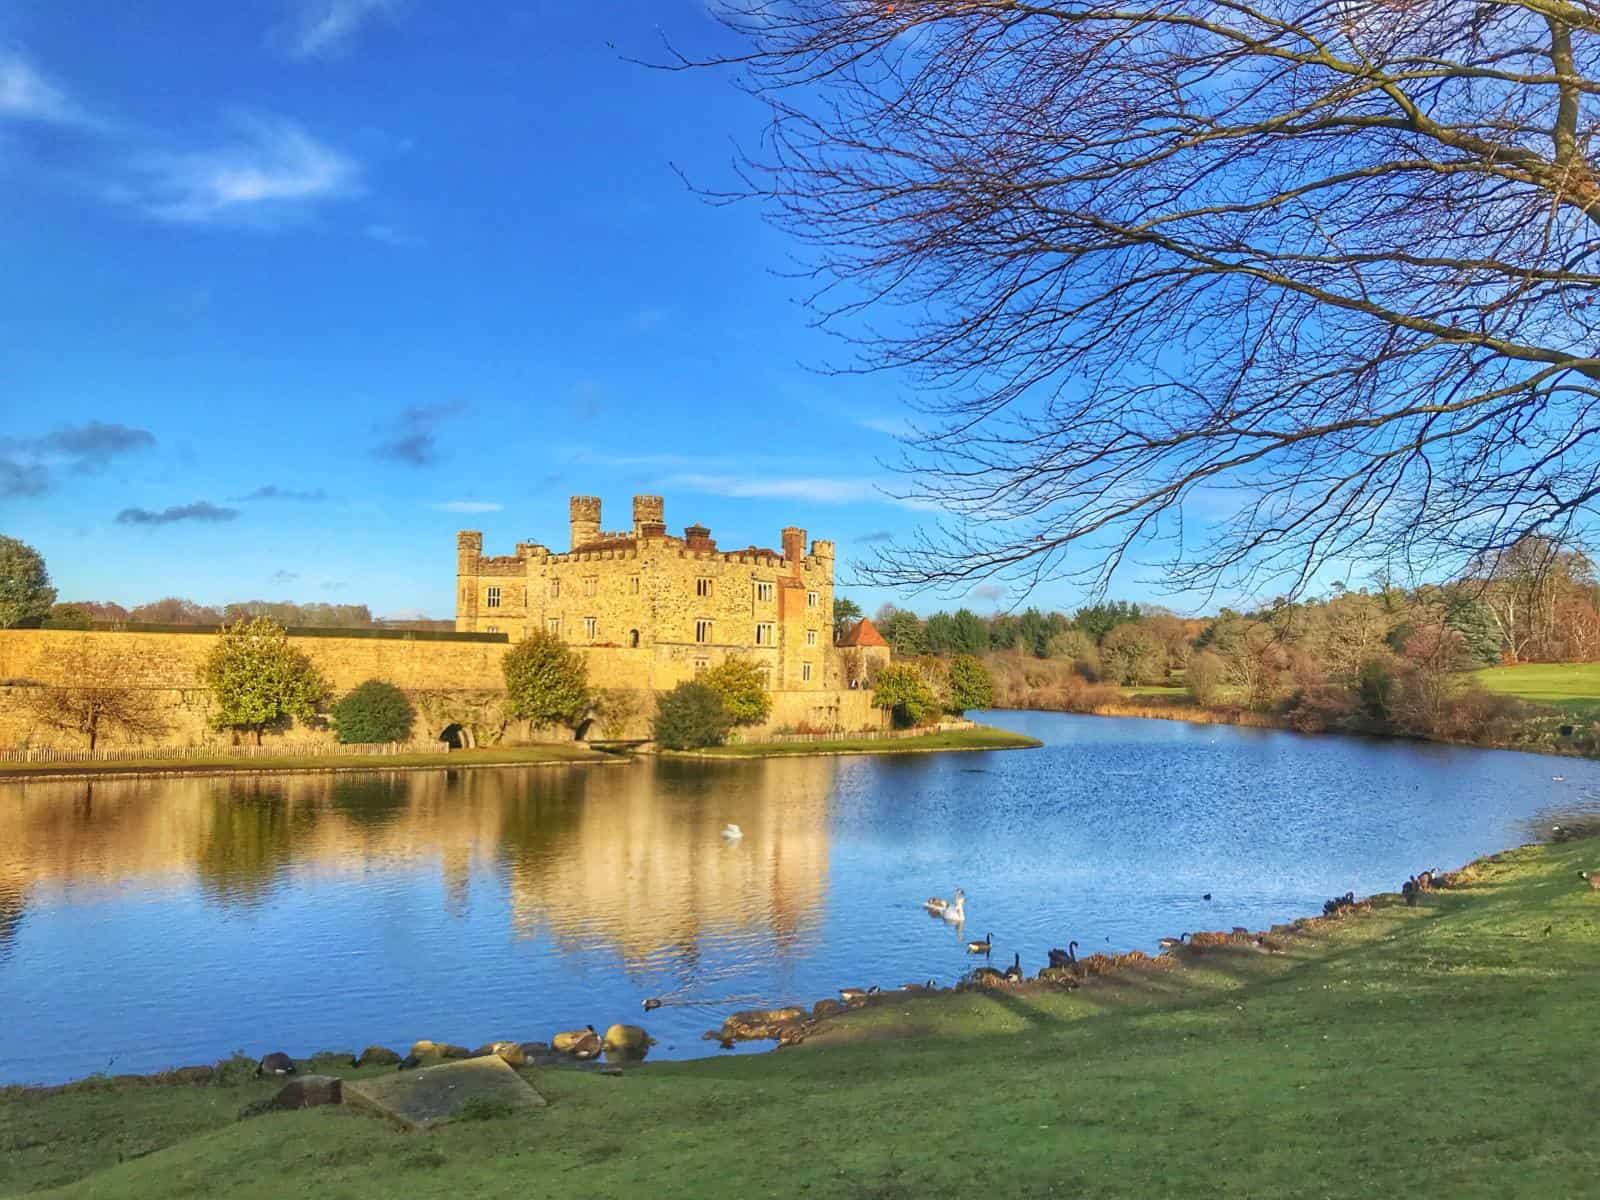 Leeds Castle - Best Winter Day Trip from London - day trips from london in december